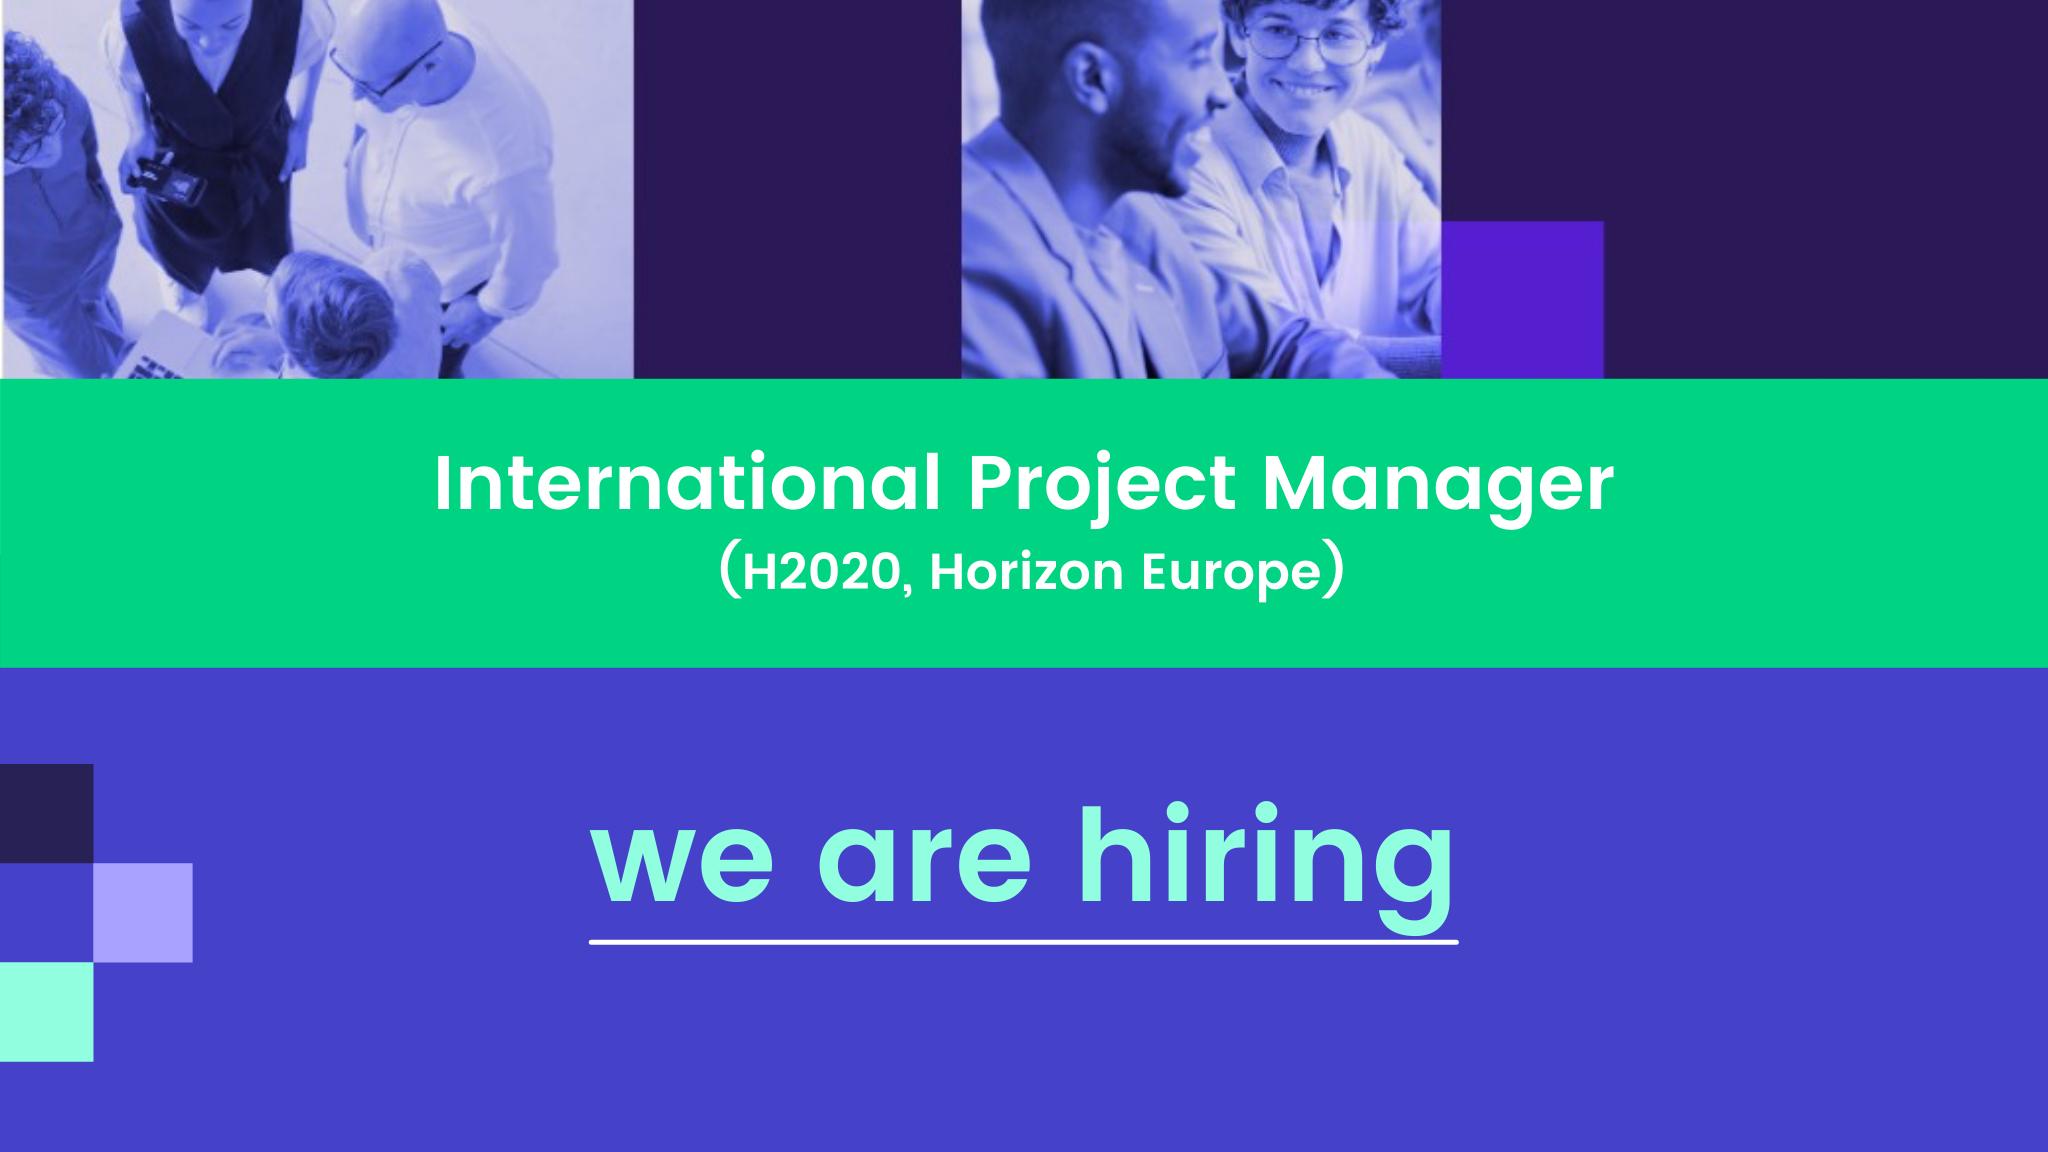 Datawizard - International Project Manager